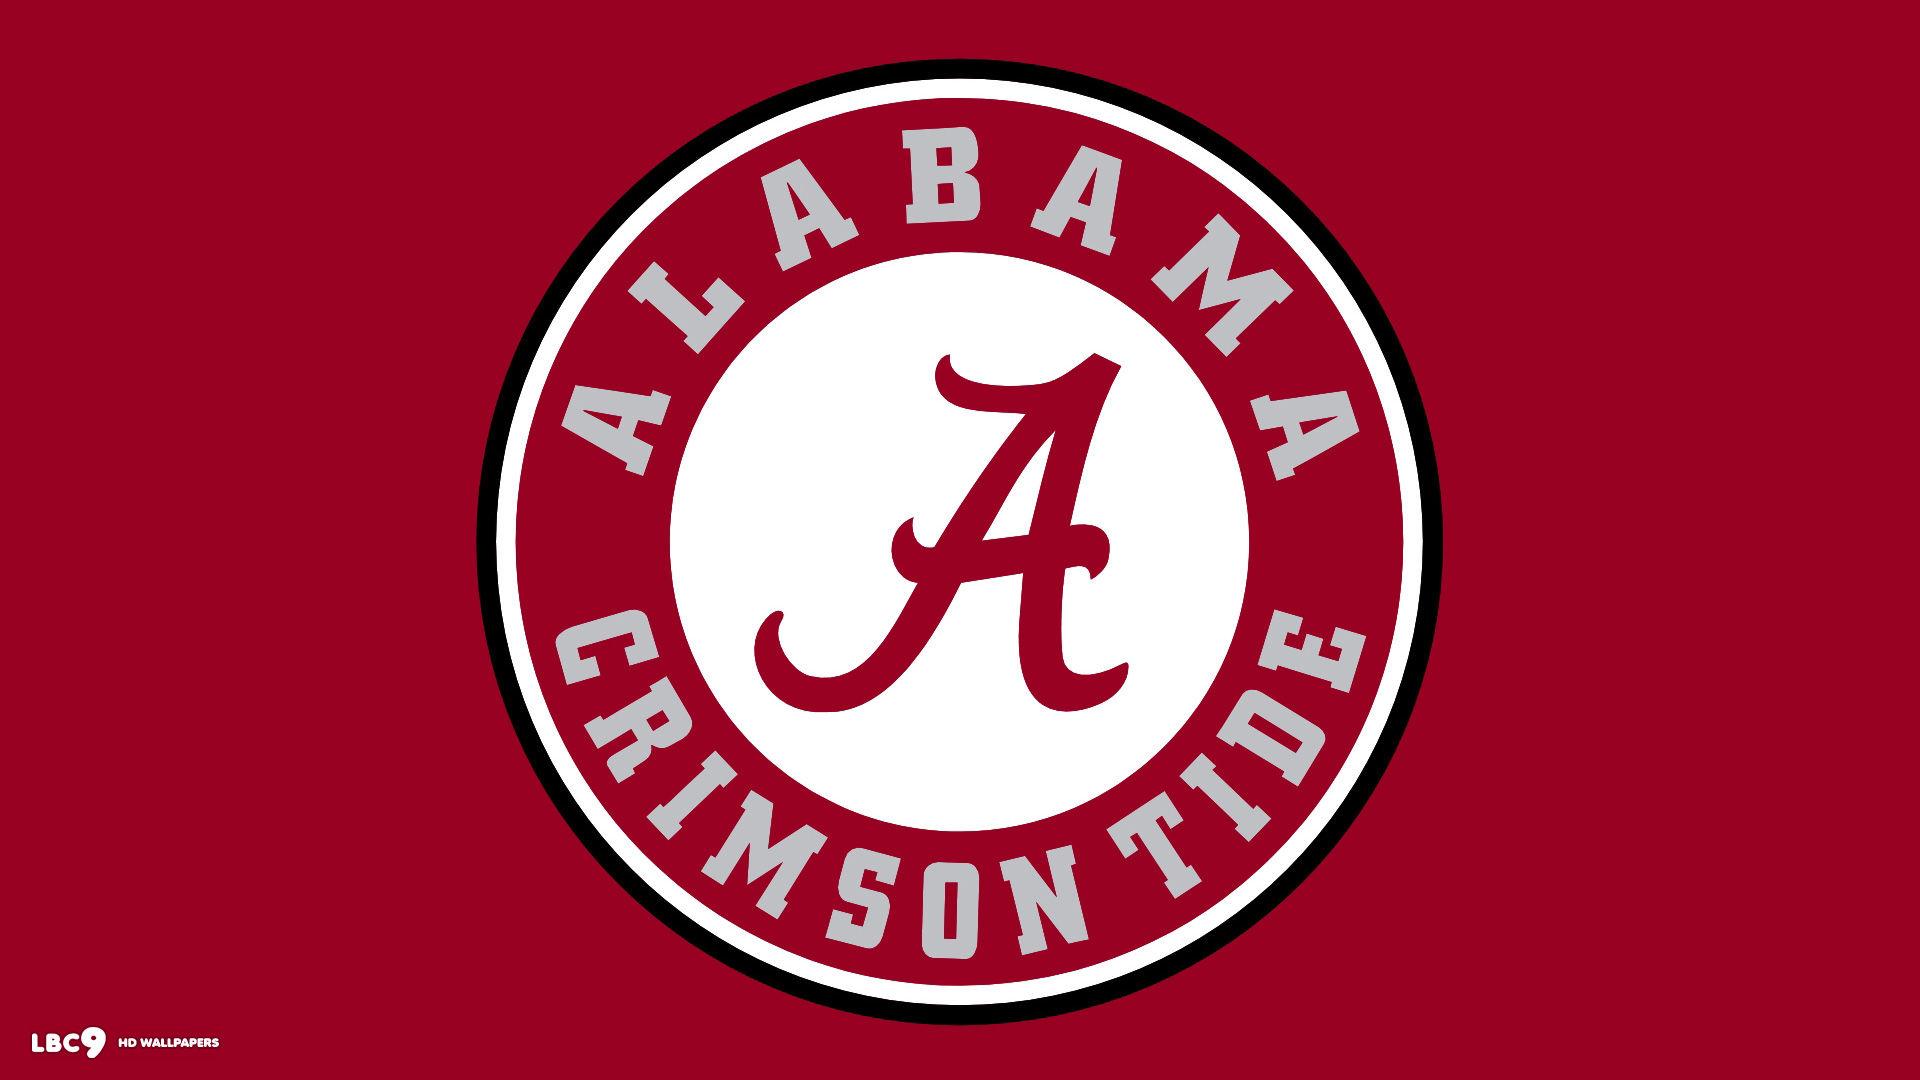 Alabama-Crimson-Tide-Roll-Tide-ROLL-Lots-More-Bama-Pics-to-Share-at-TidePics-com-wallpaper-wp3602323